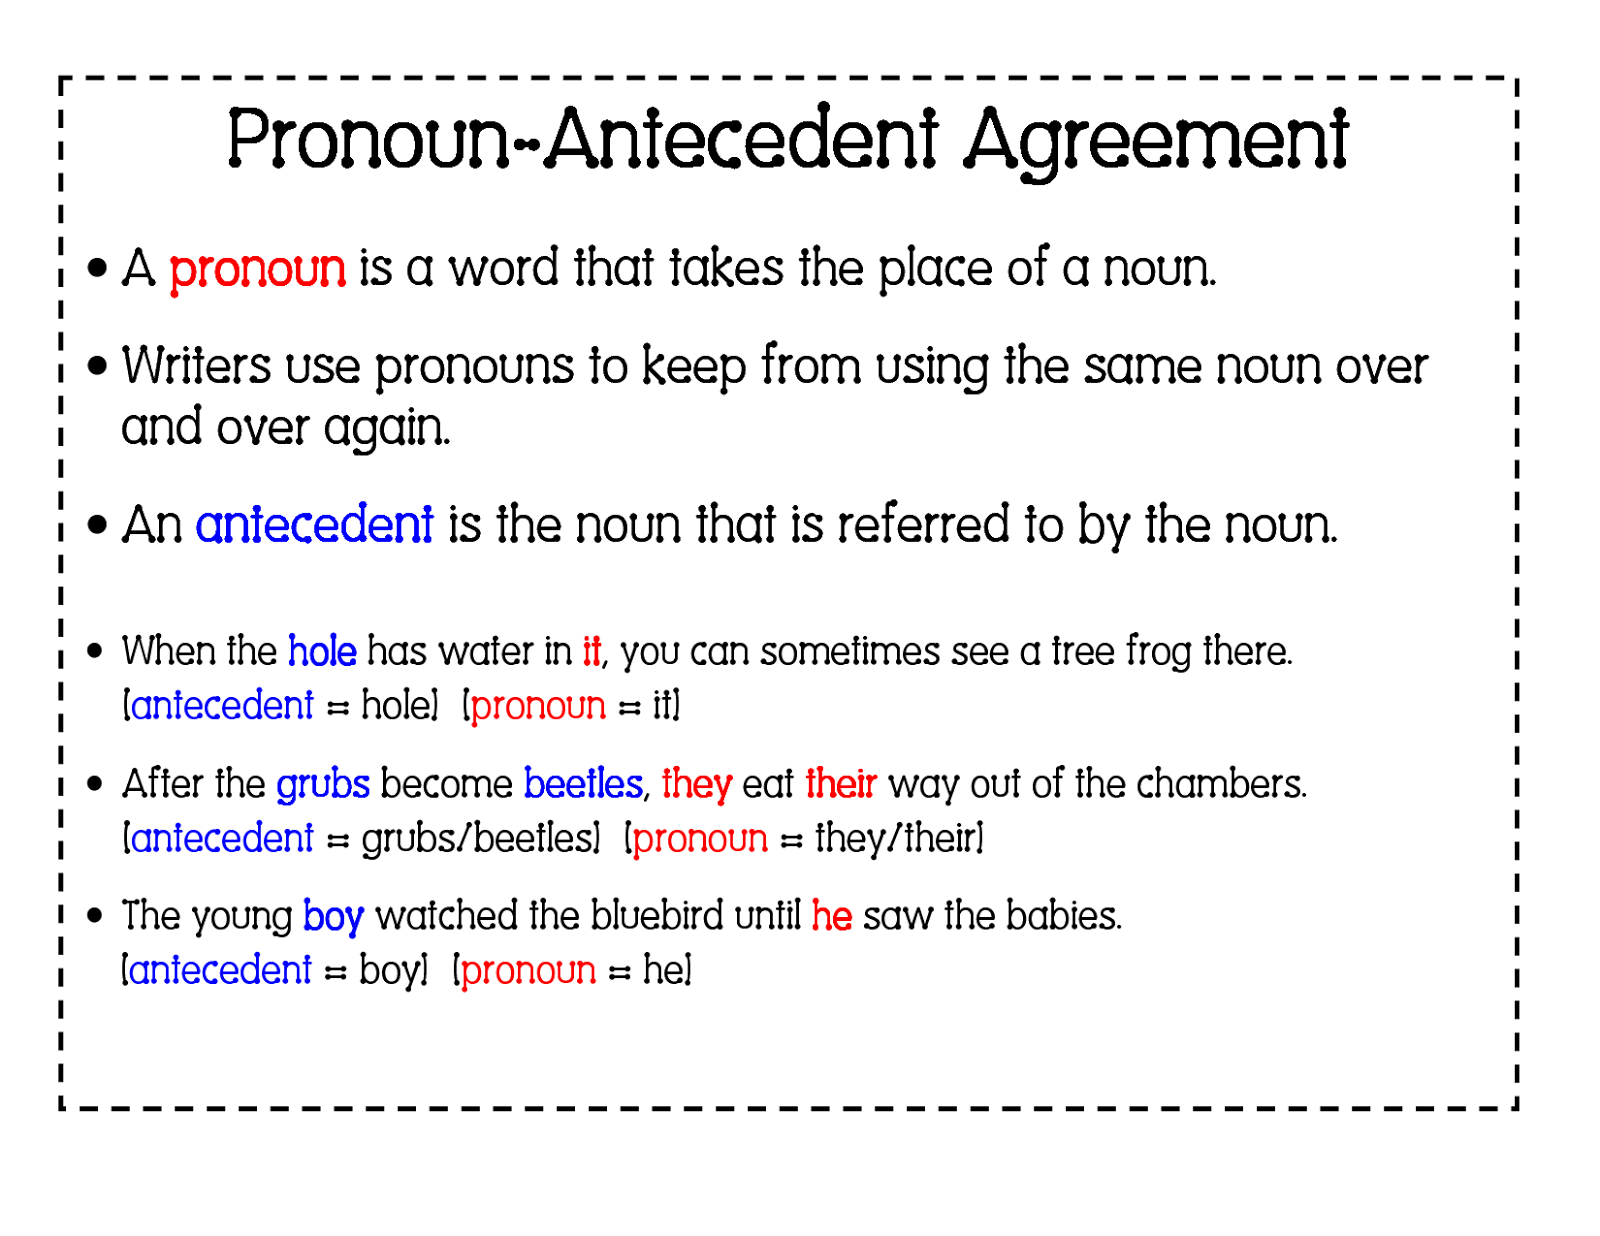 medium resolution of 6th Grade English with Mr. T: Pronoun / Antecedent Agreement   Pronoun  antecedent agreement